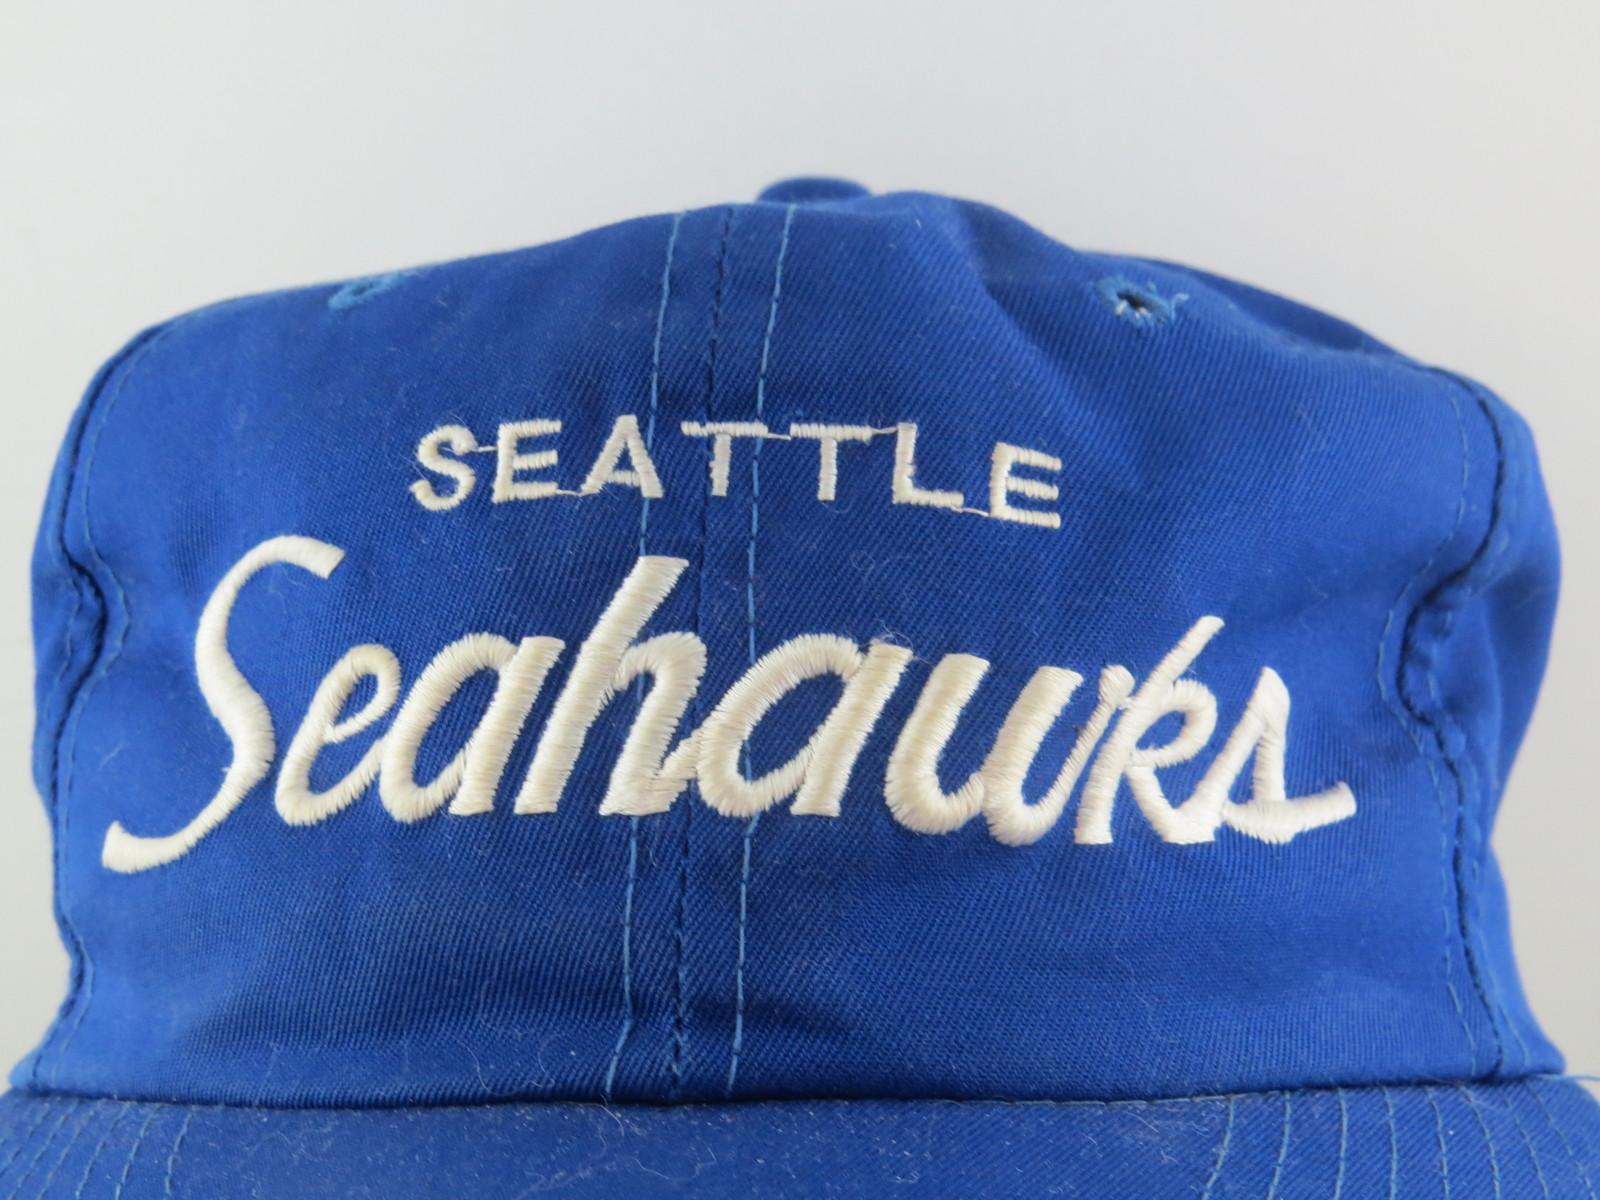 Seattle Seahawks Hat (VTG) - Sports Specialties Twill Script - Adult Snapback